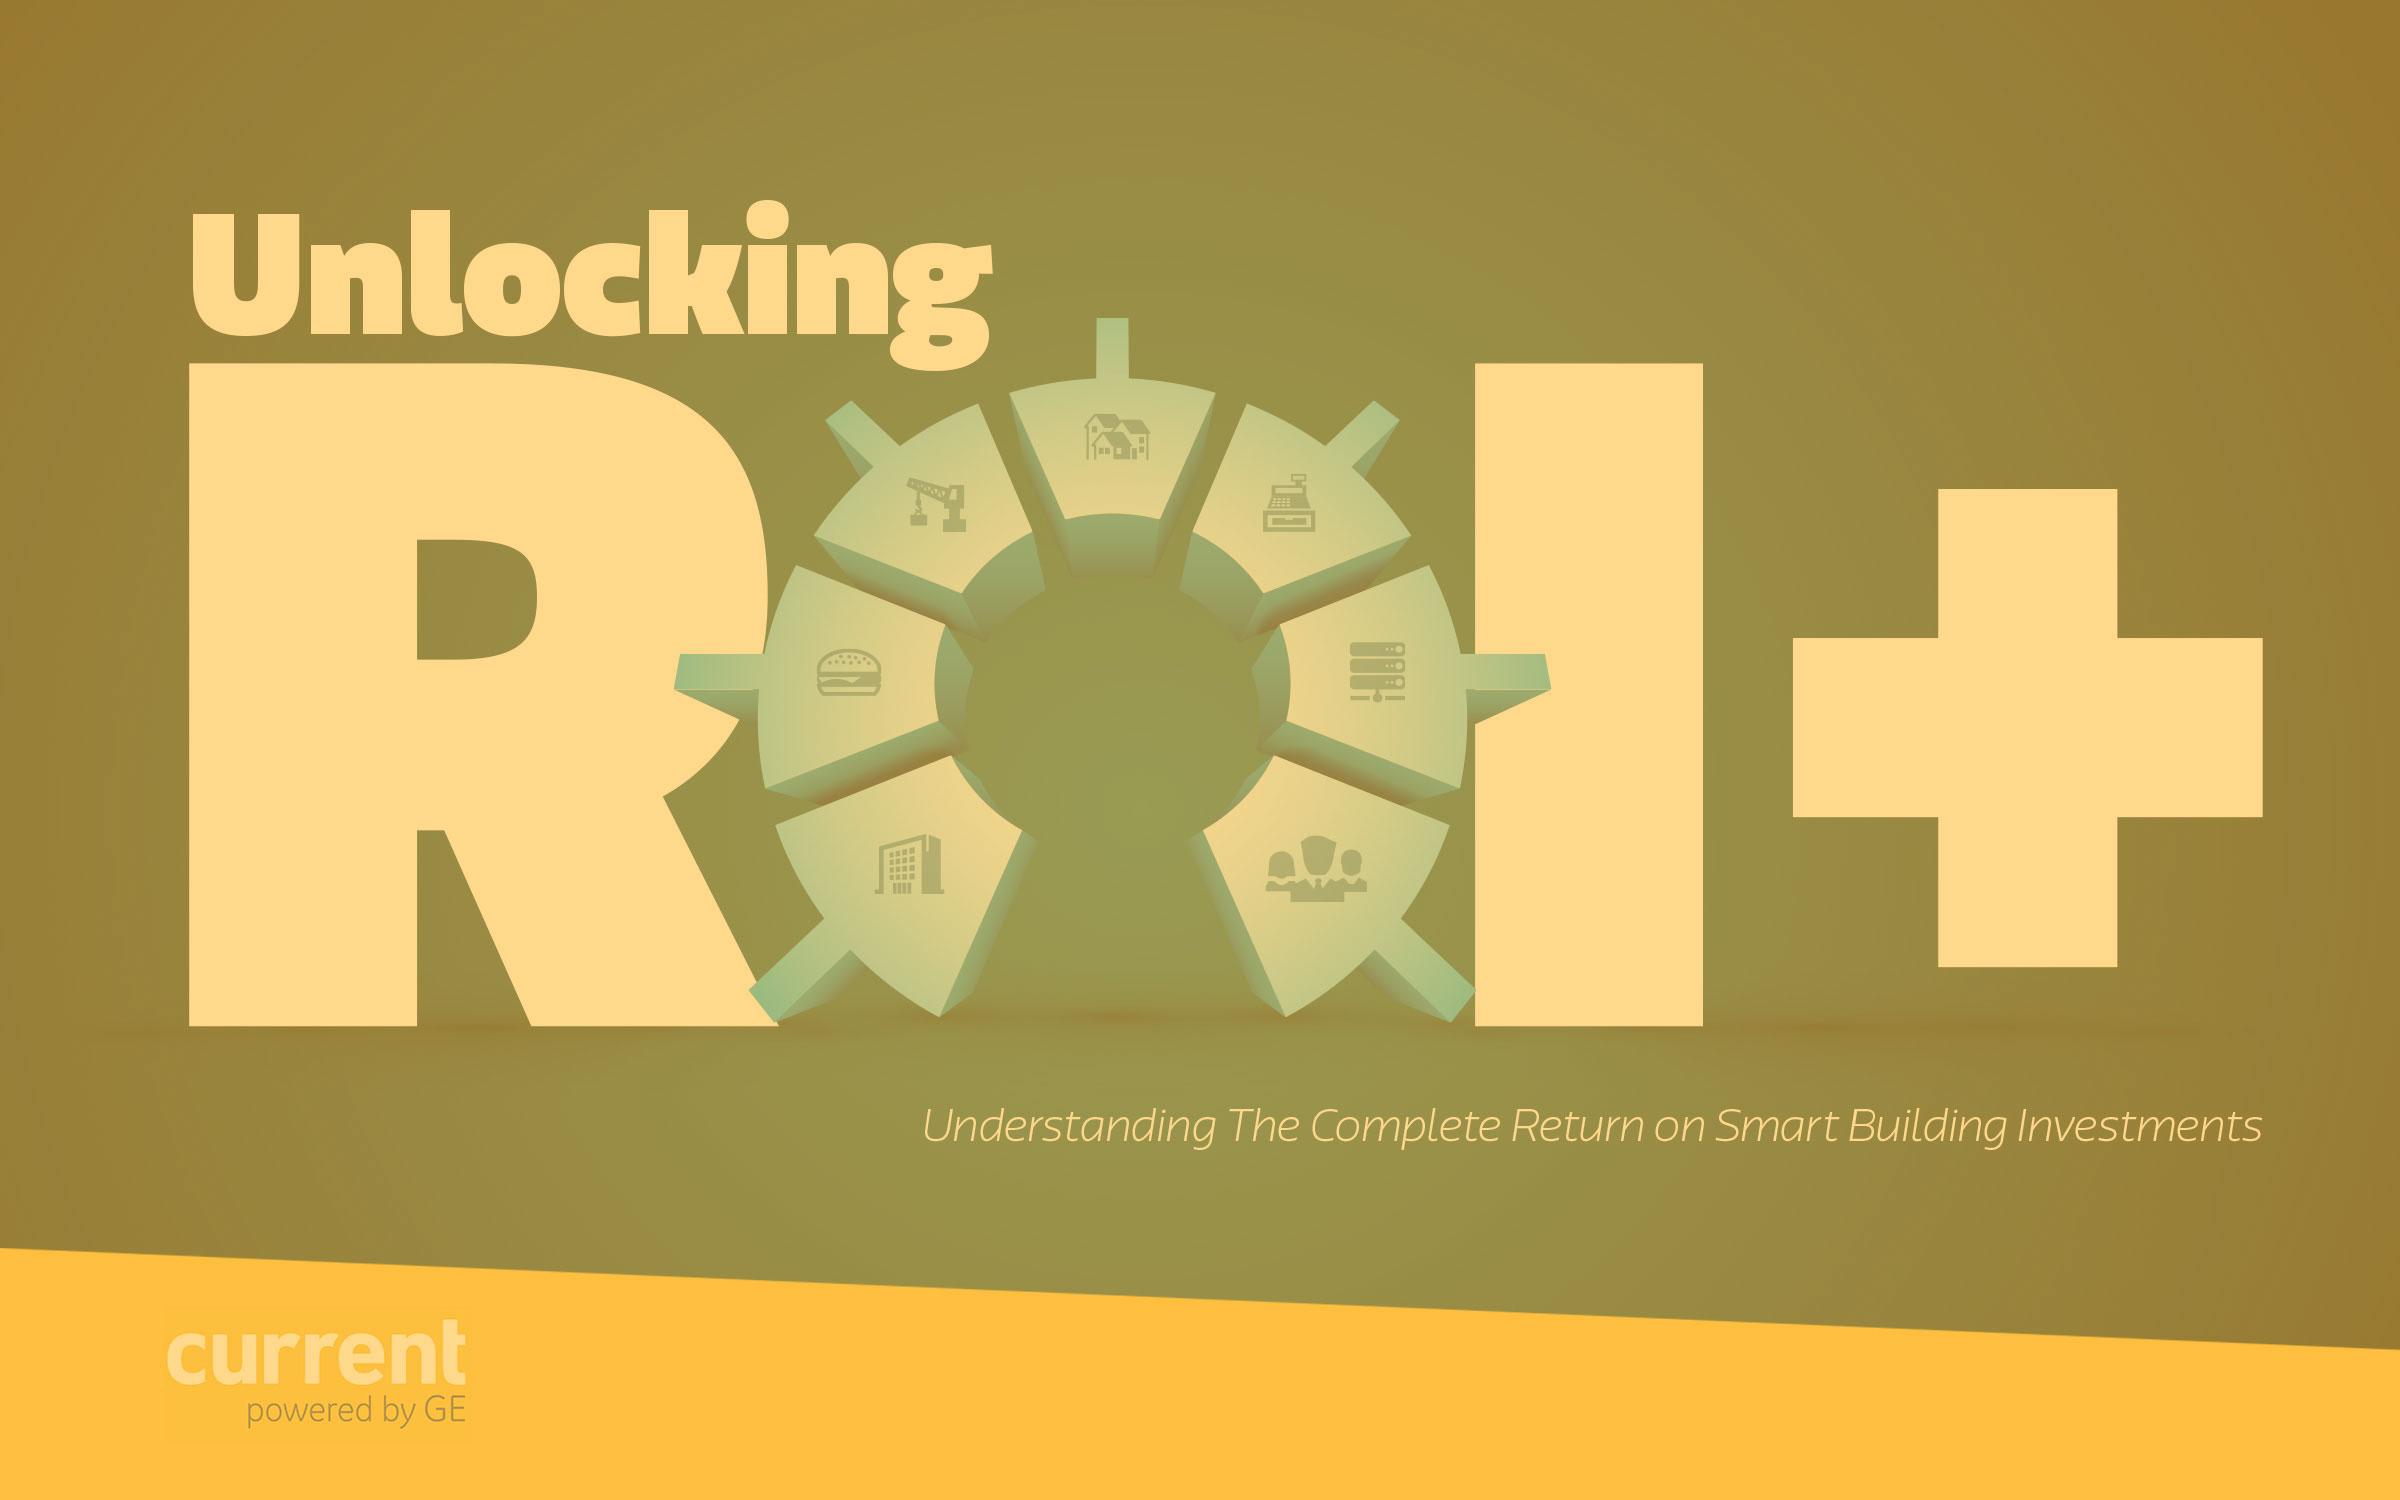 Unlocking ROI